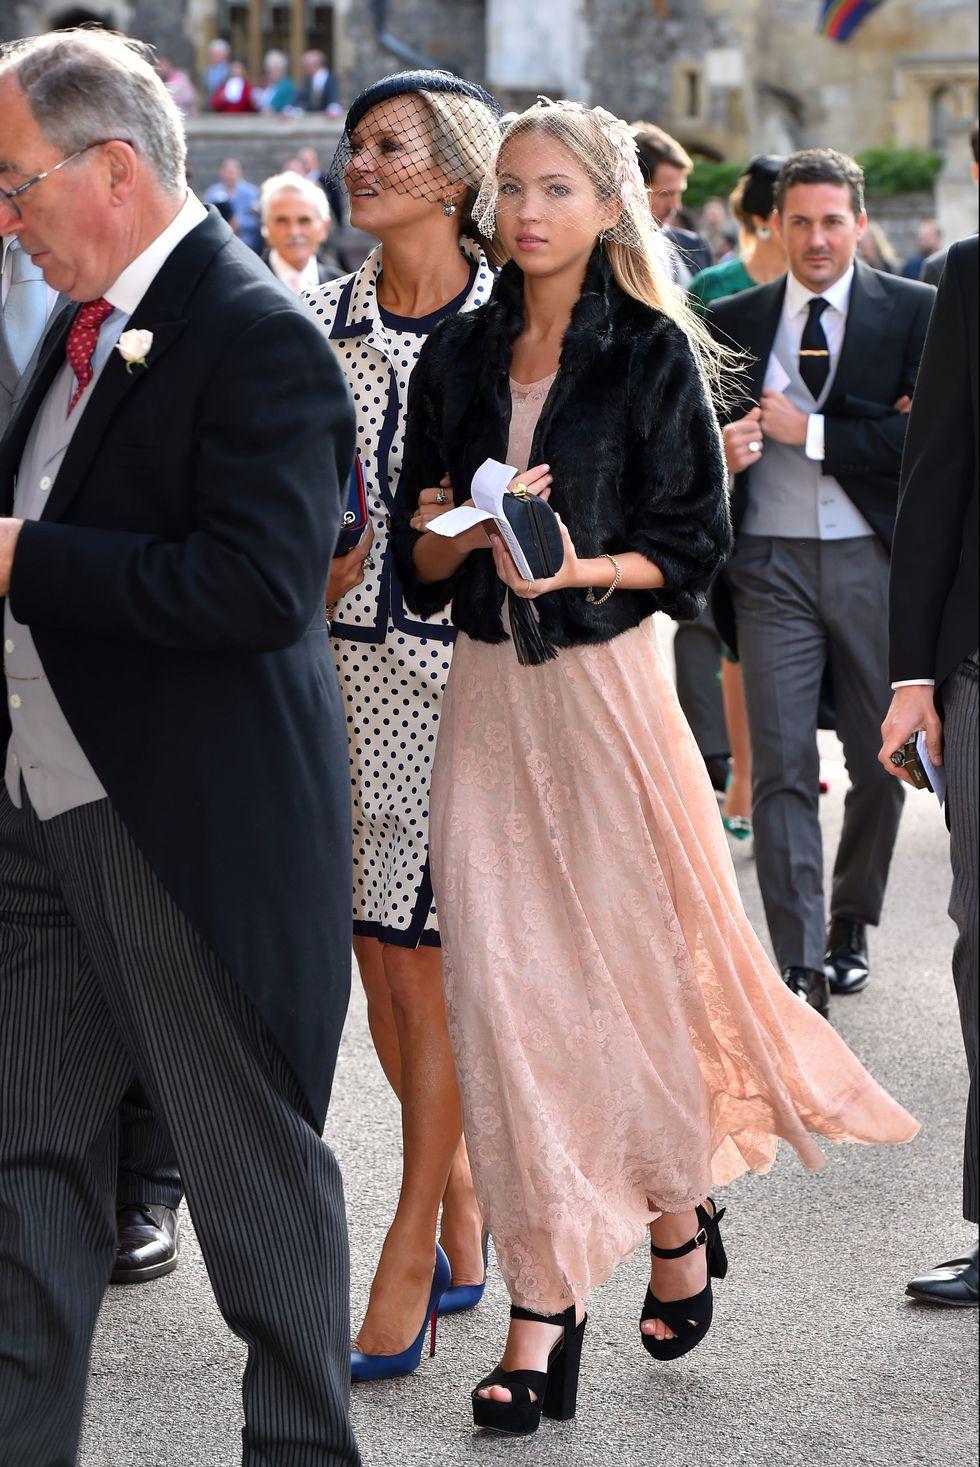 Los looks de la boda de la princesa Eugenia en Inglaterra ...